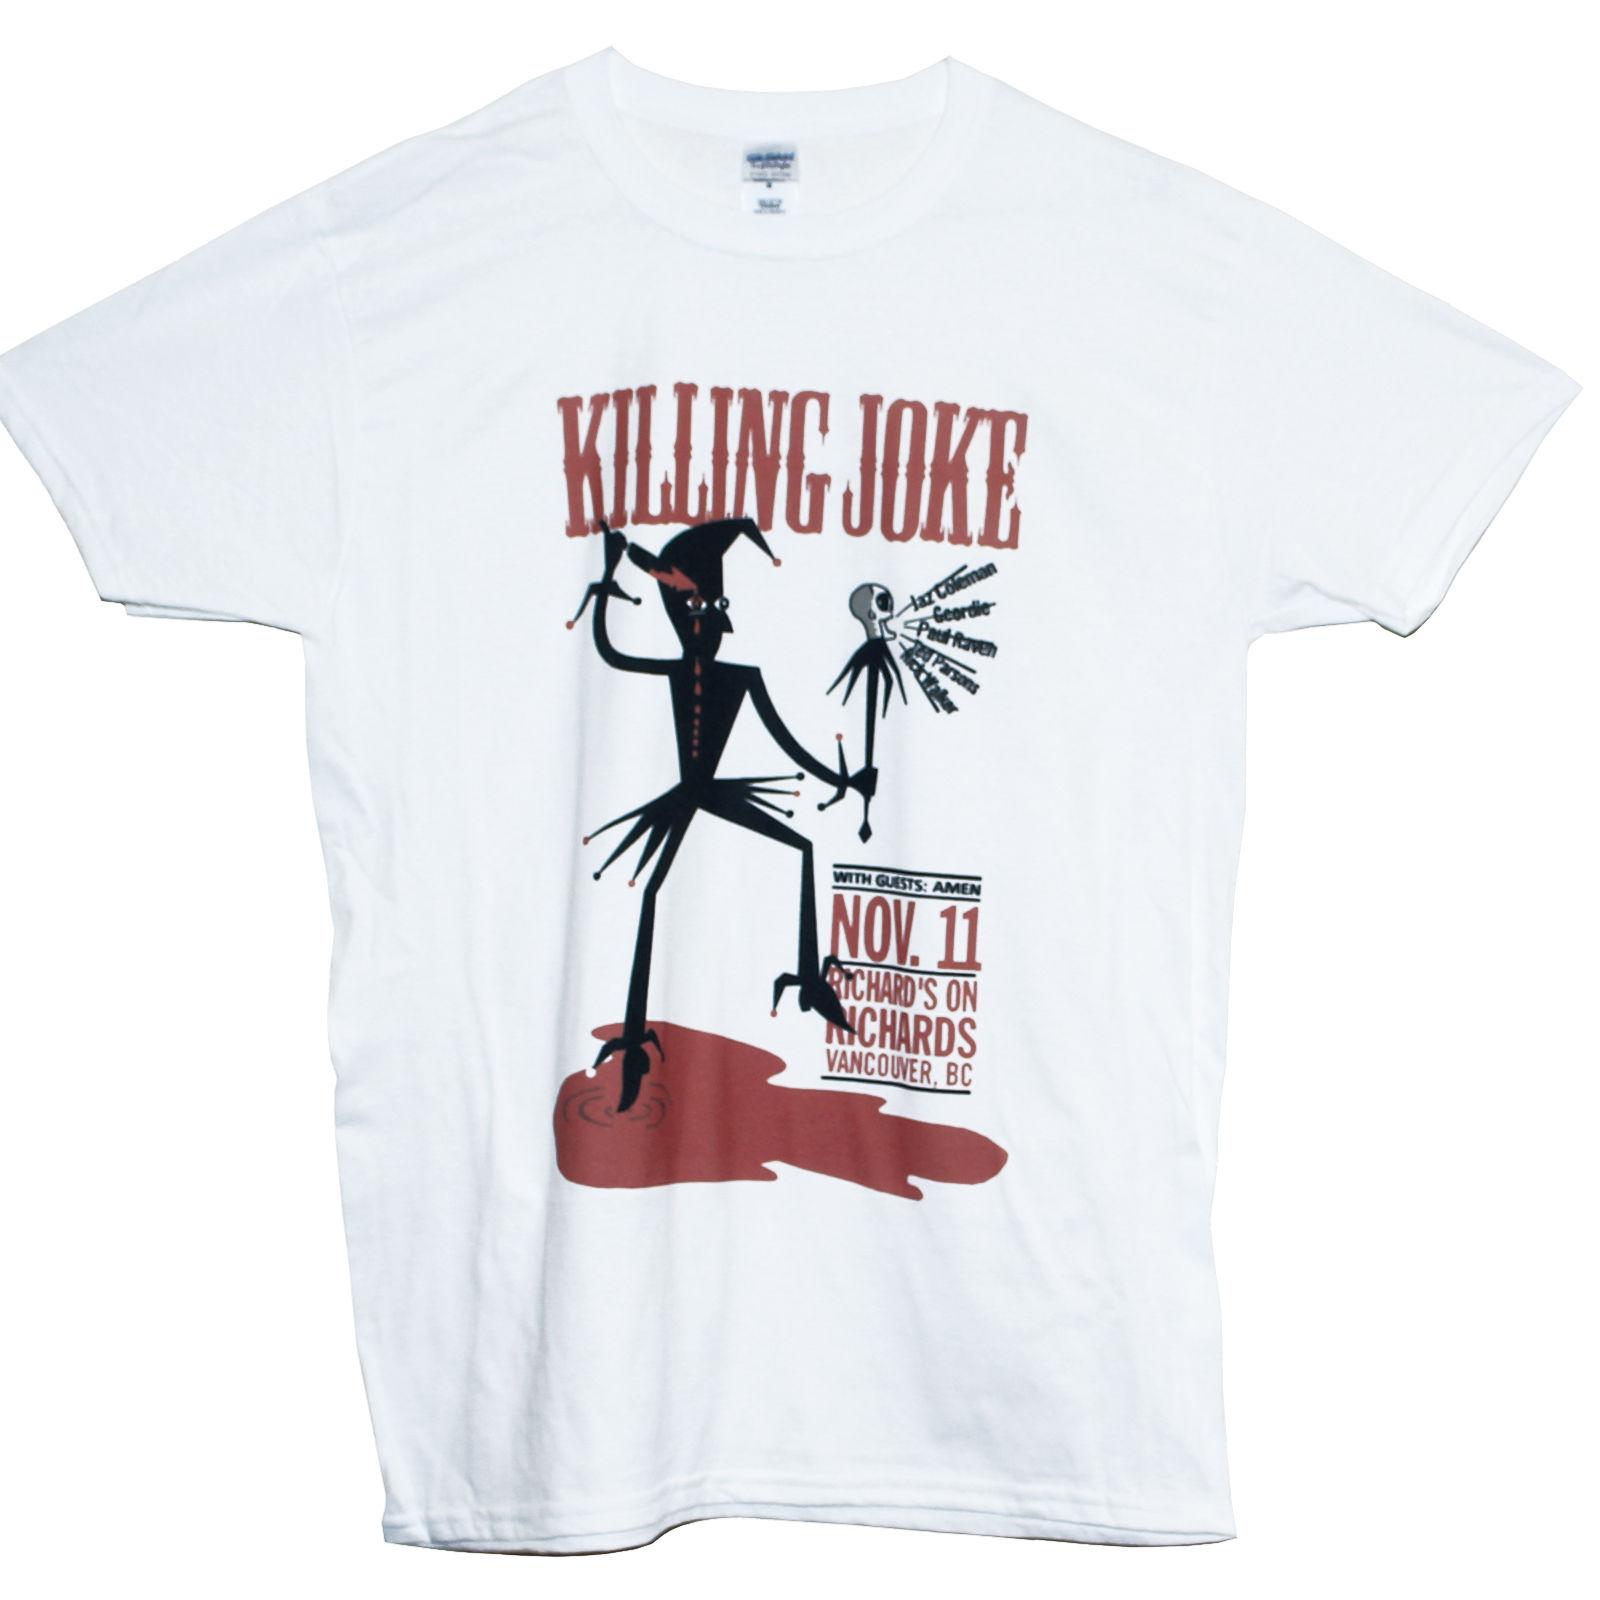 KILLING JOKE T SHIRT Bauhaus Soundgarden Industrial Rock Goth Metal Band Tee